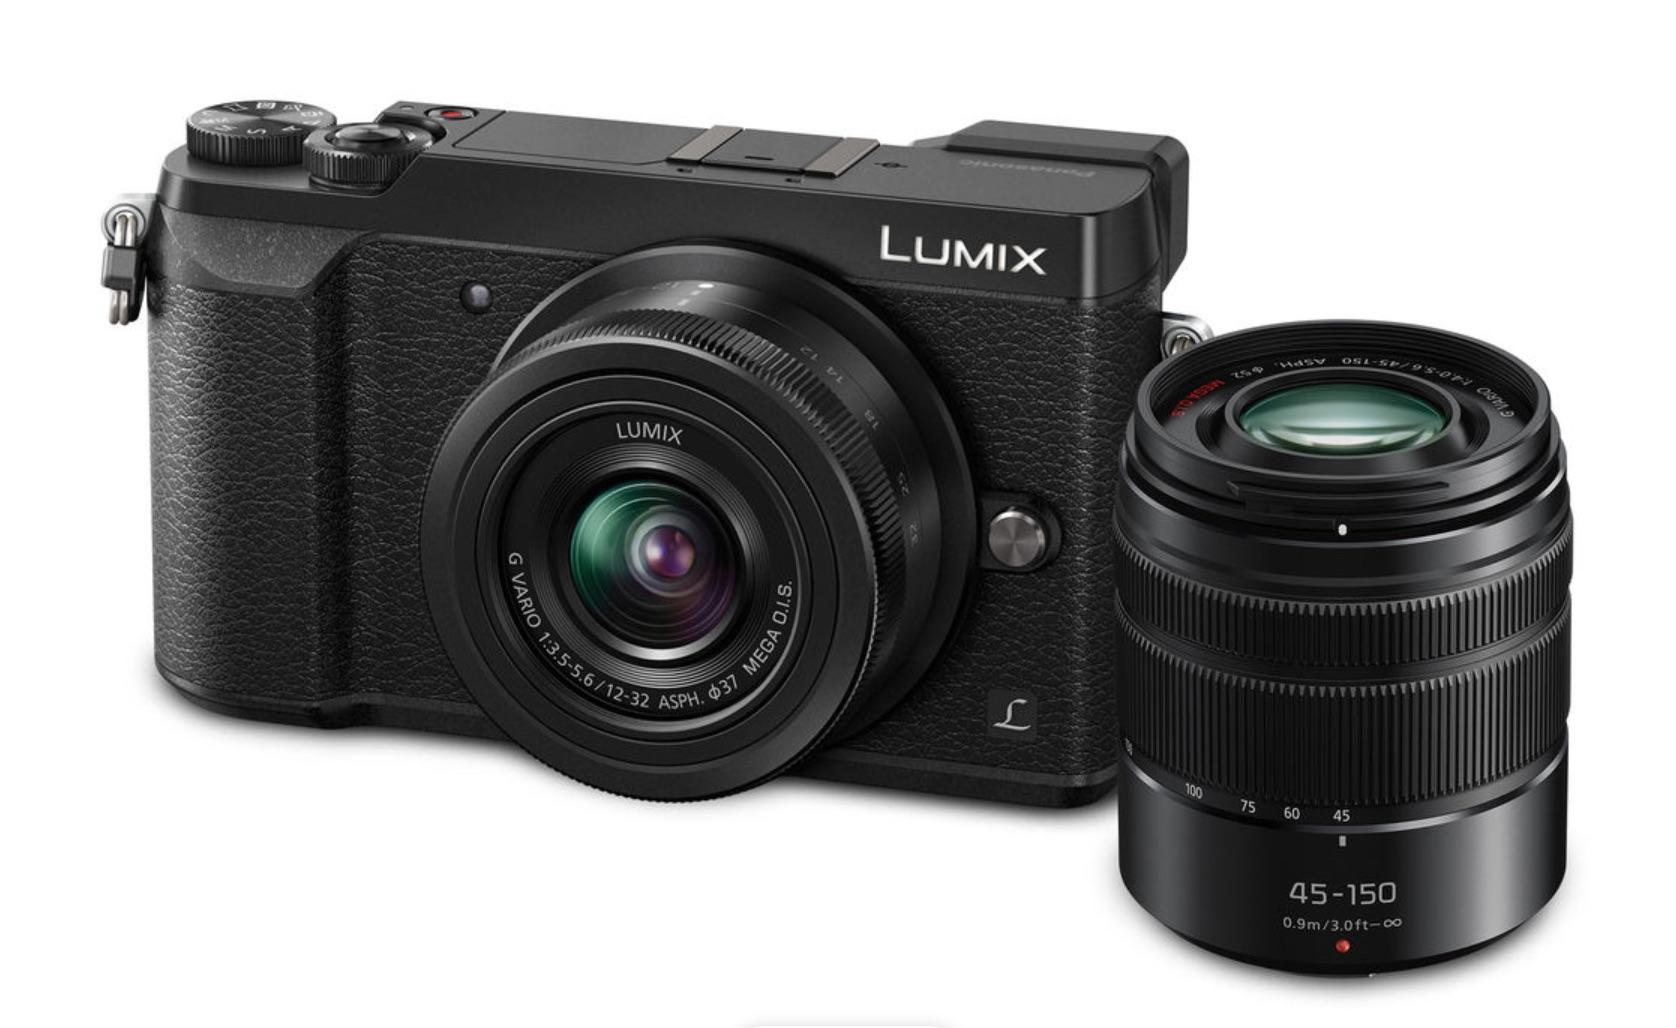 http://thedigitalstory.com/2019/11/26/Lumix-MFT-Camera.jpg